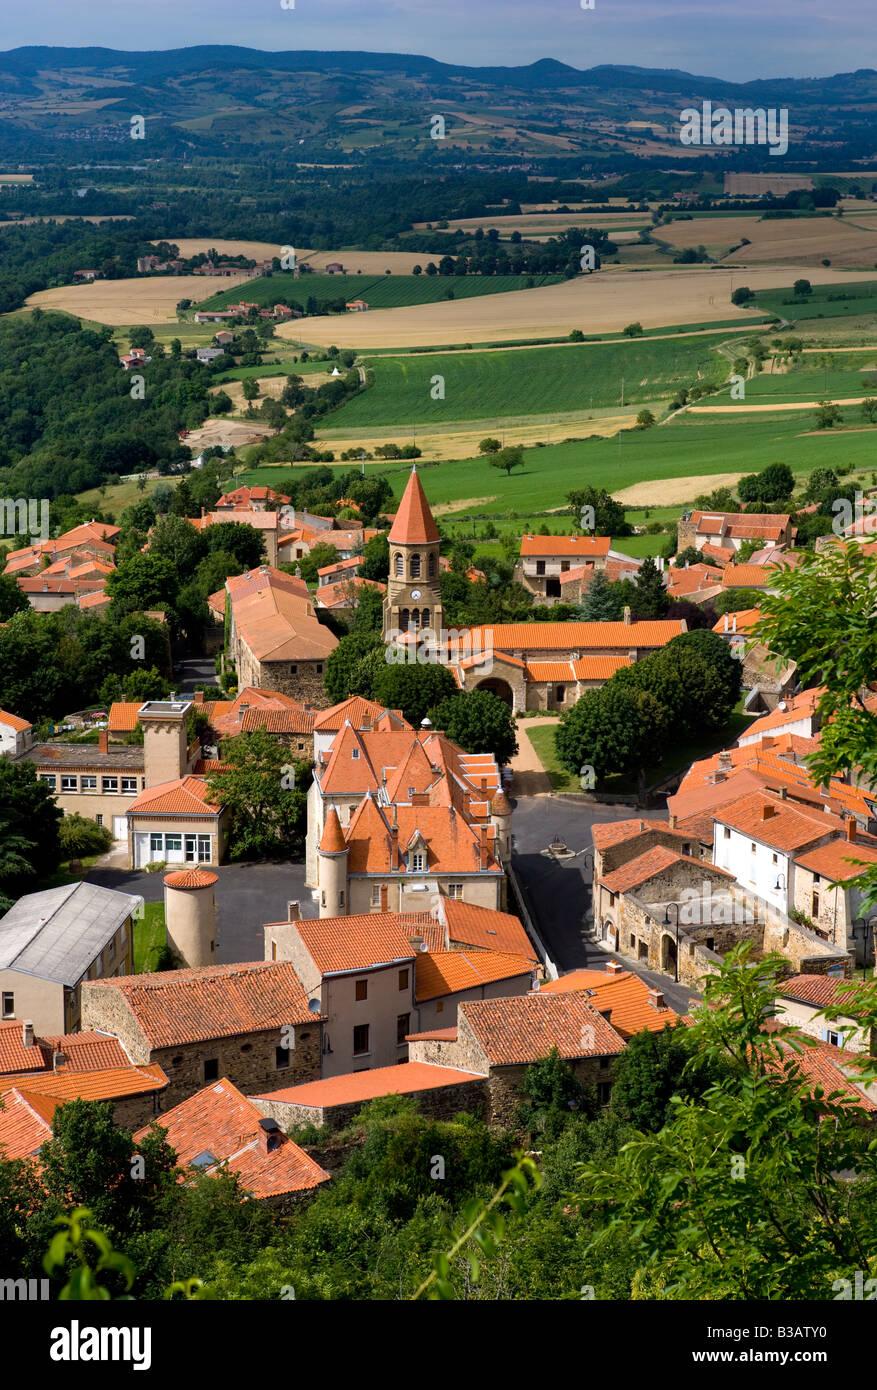 village of nonette,auvergne,france - Stock Image